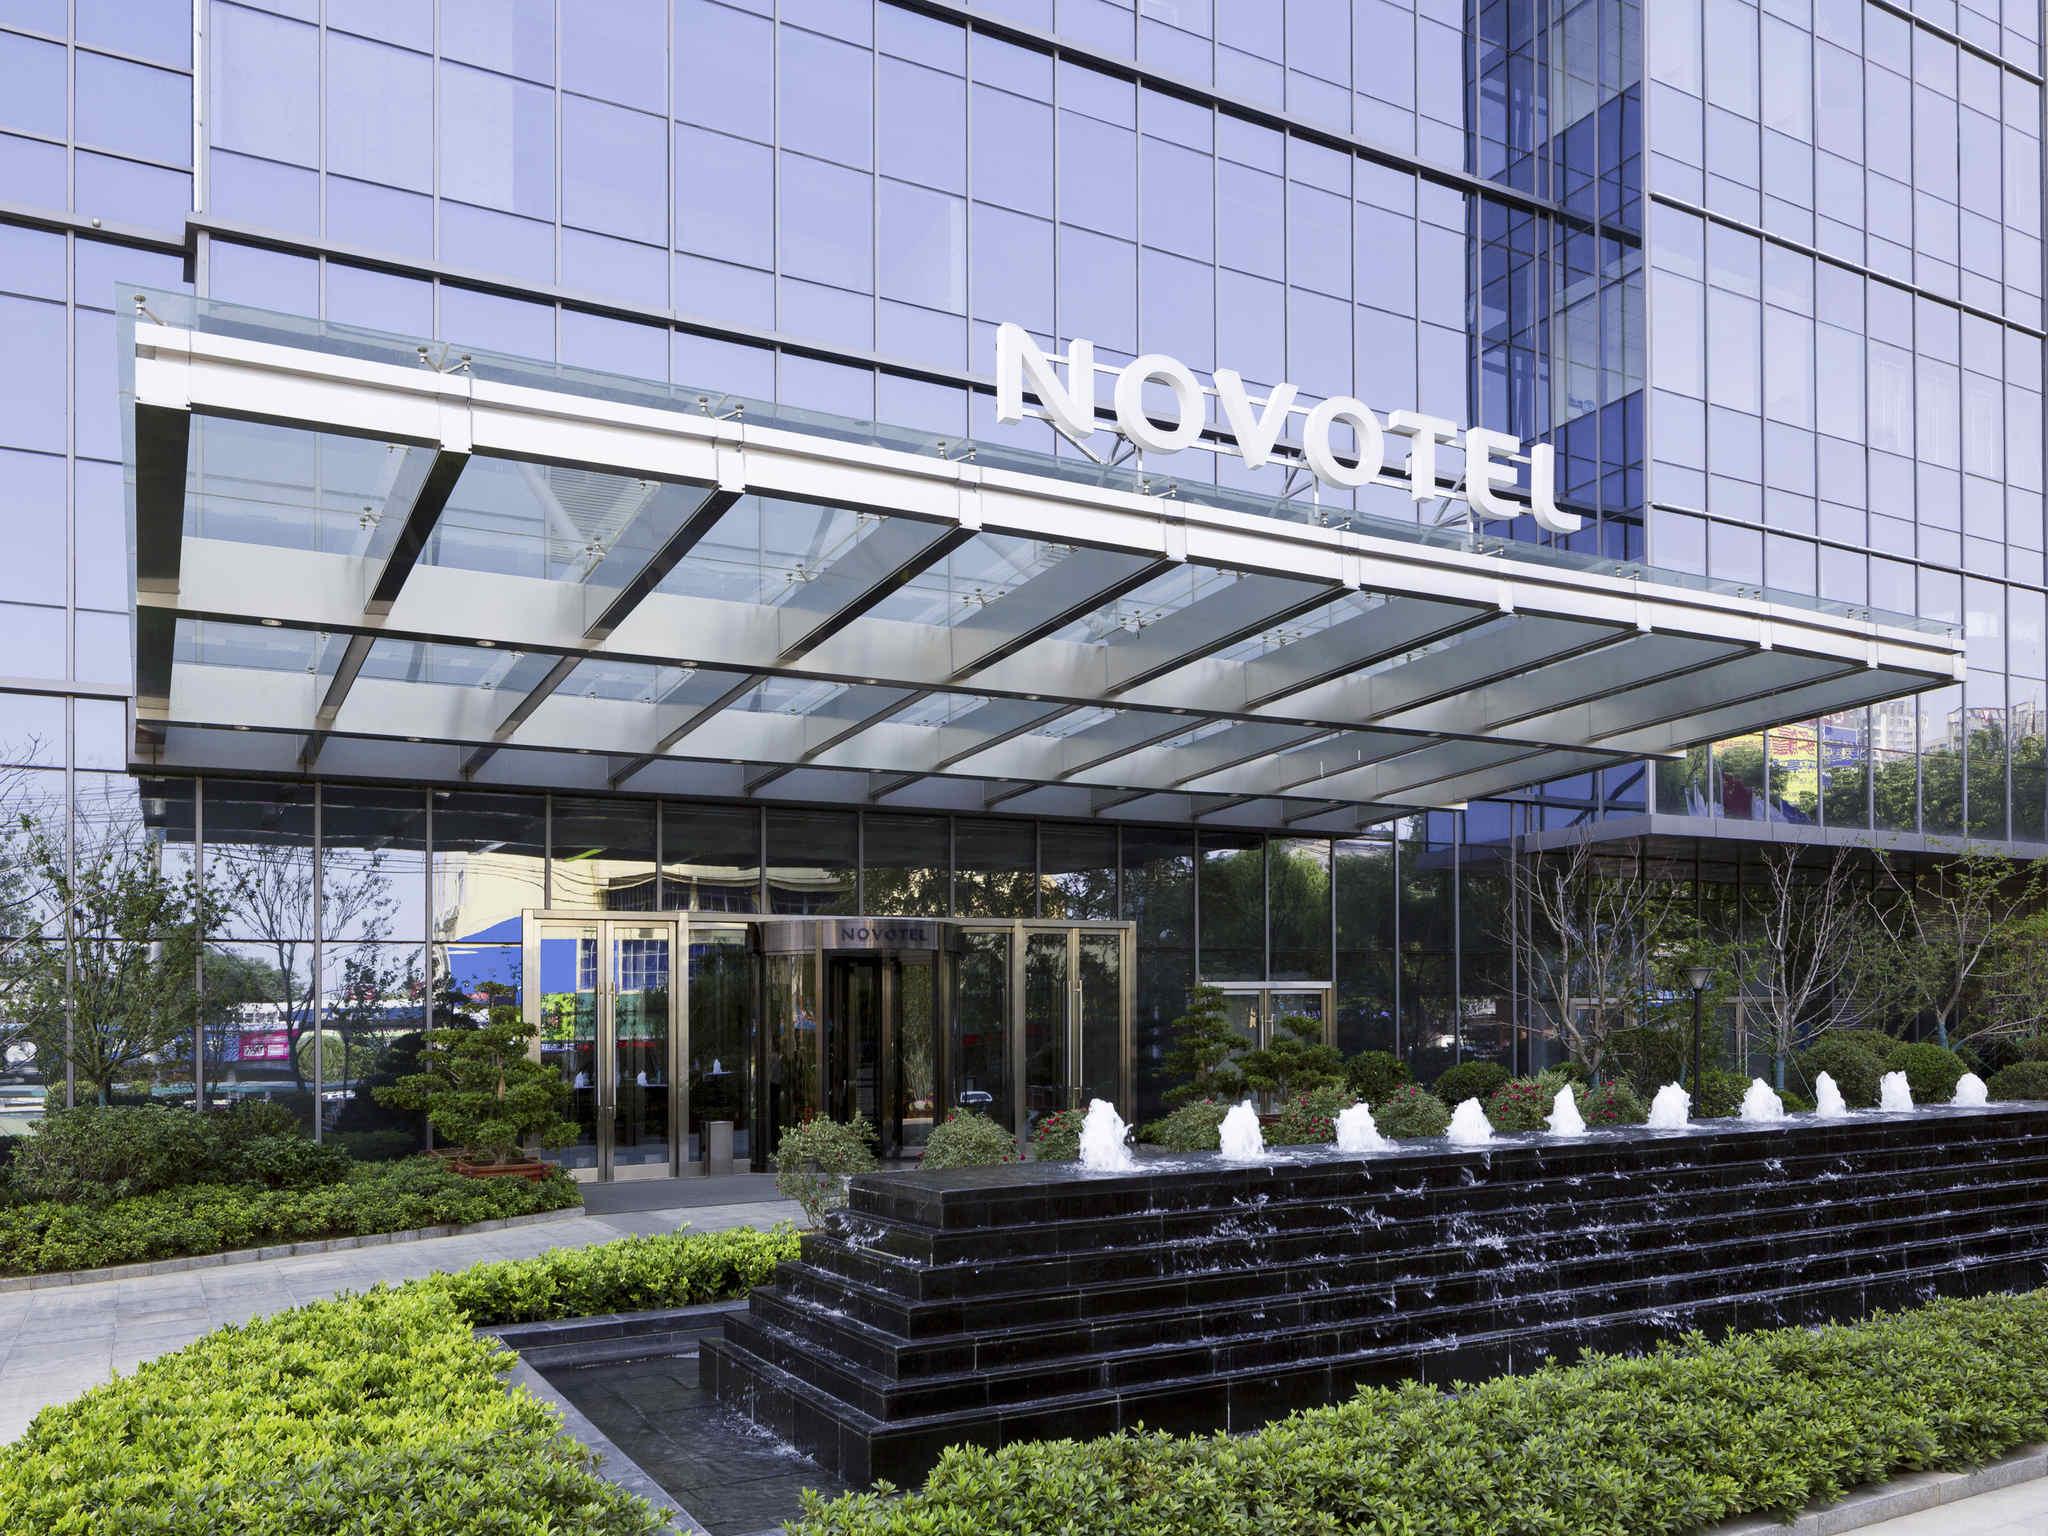 Hotel – Novotel Rizhao Suning